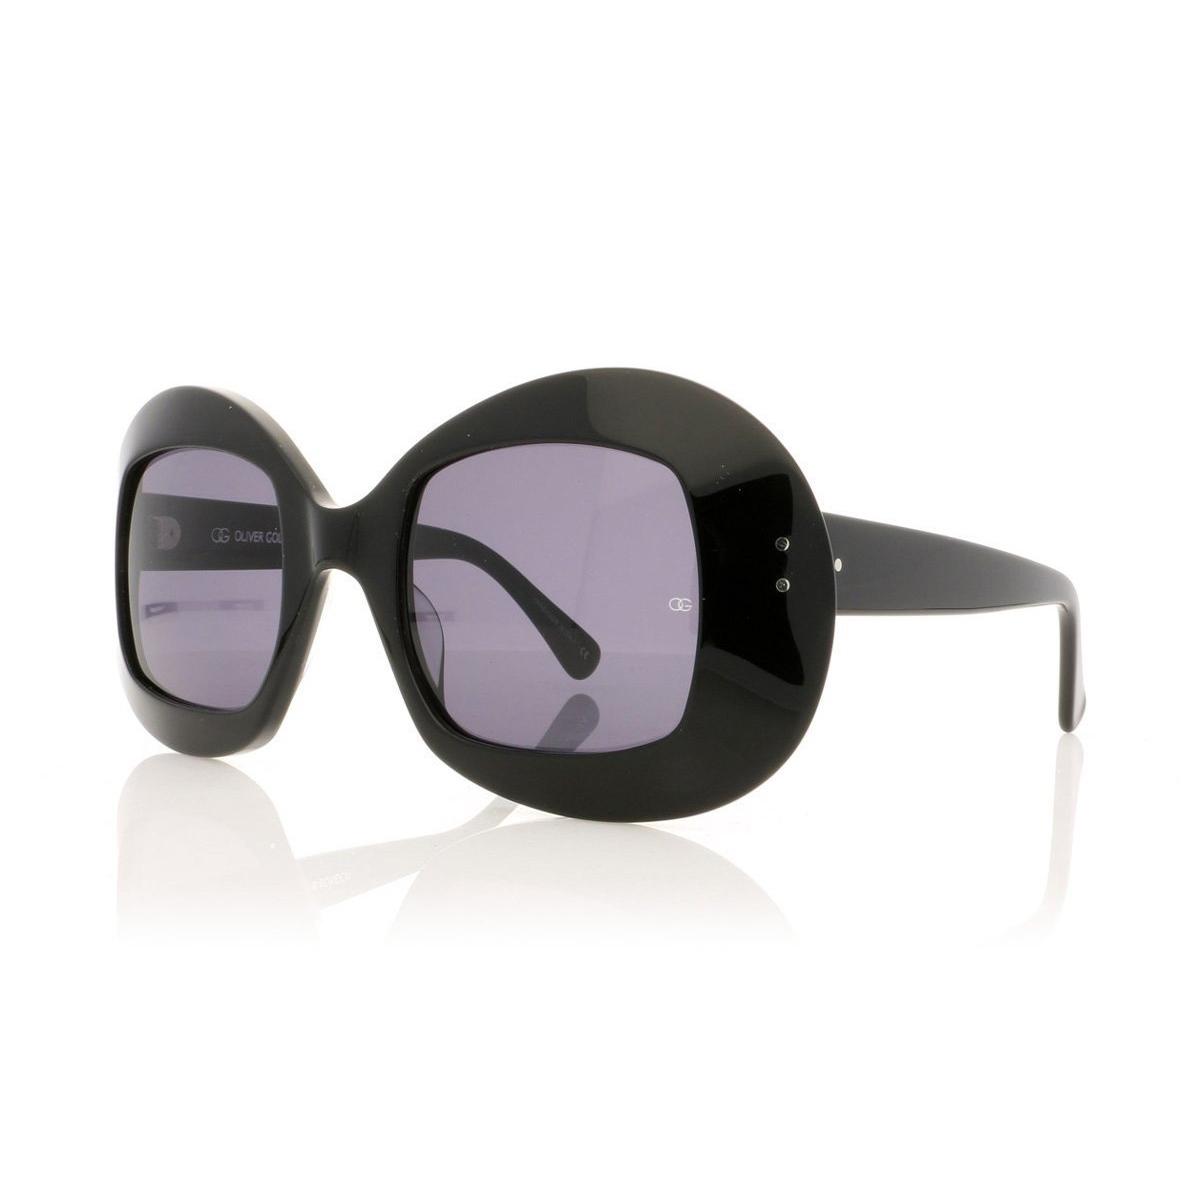 File:Oliver Goldsmith Uuksuu Sunglasses.jpg